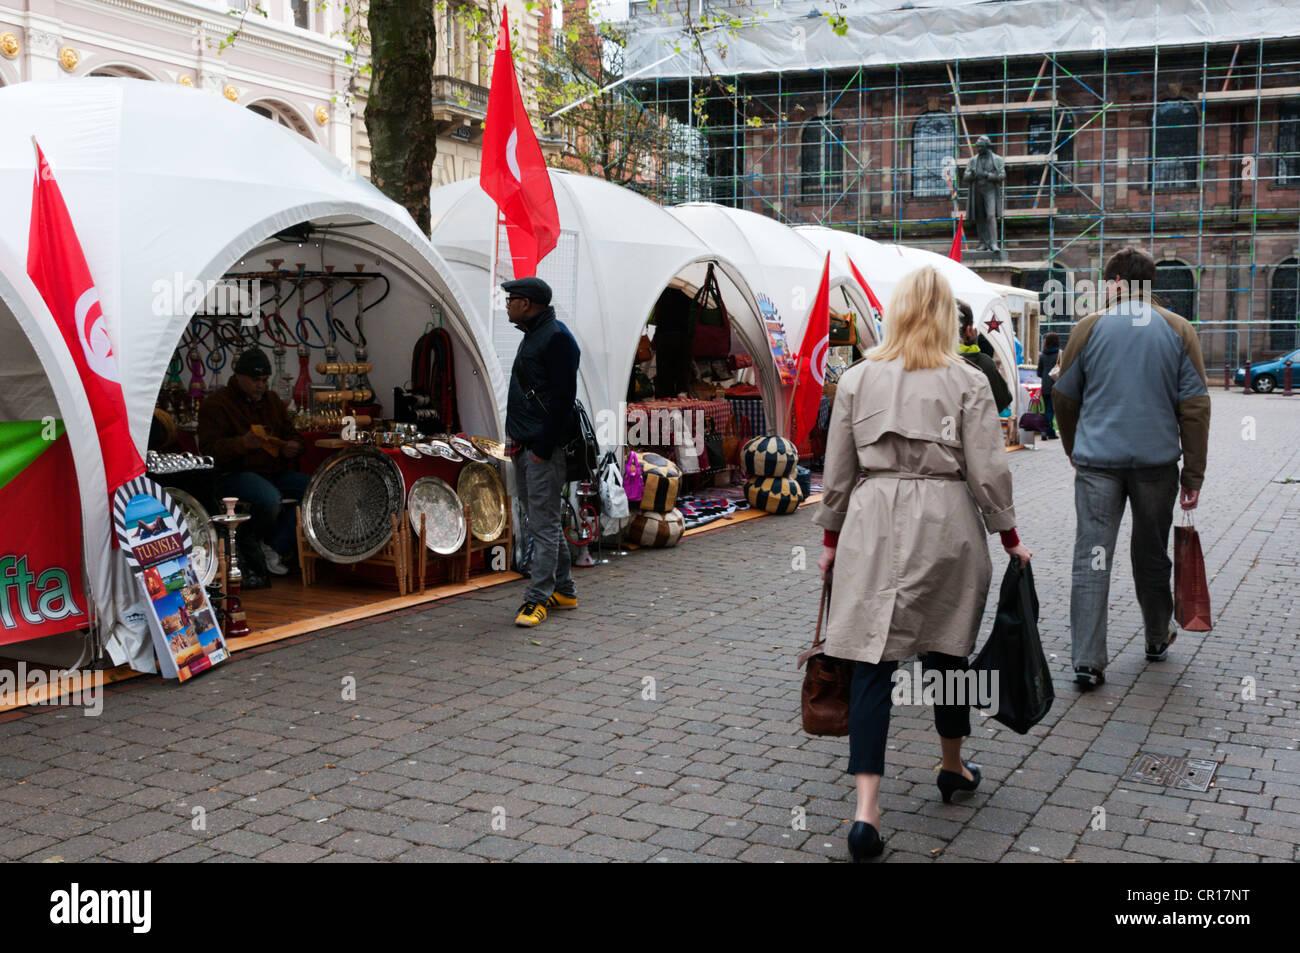 A Tunisian Market in St Anne's Square, Manchester. Stock Photo